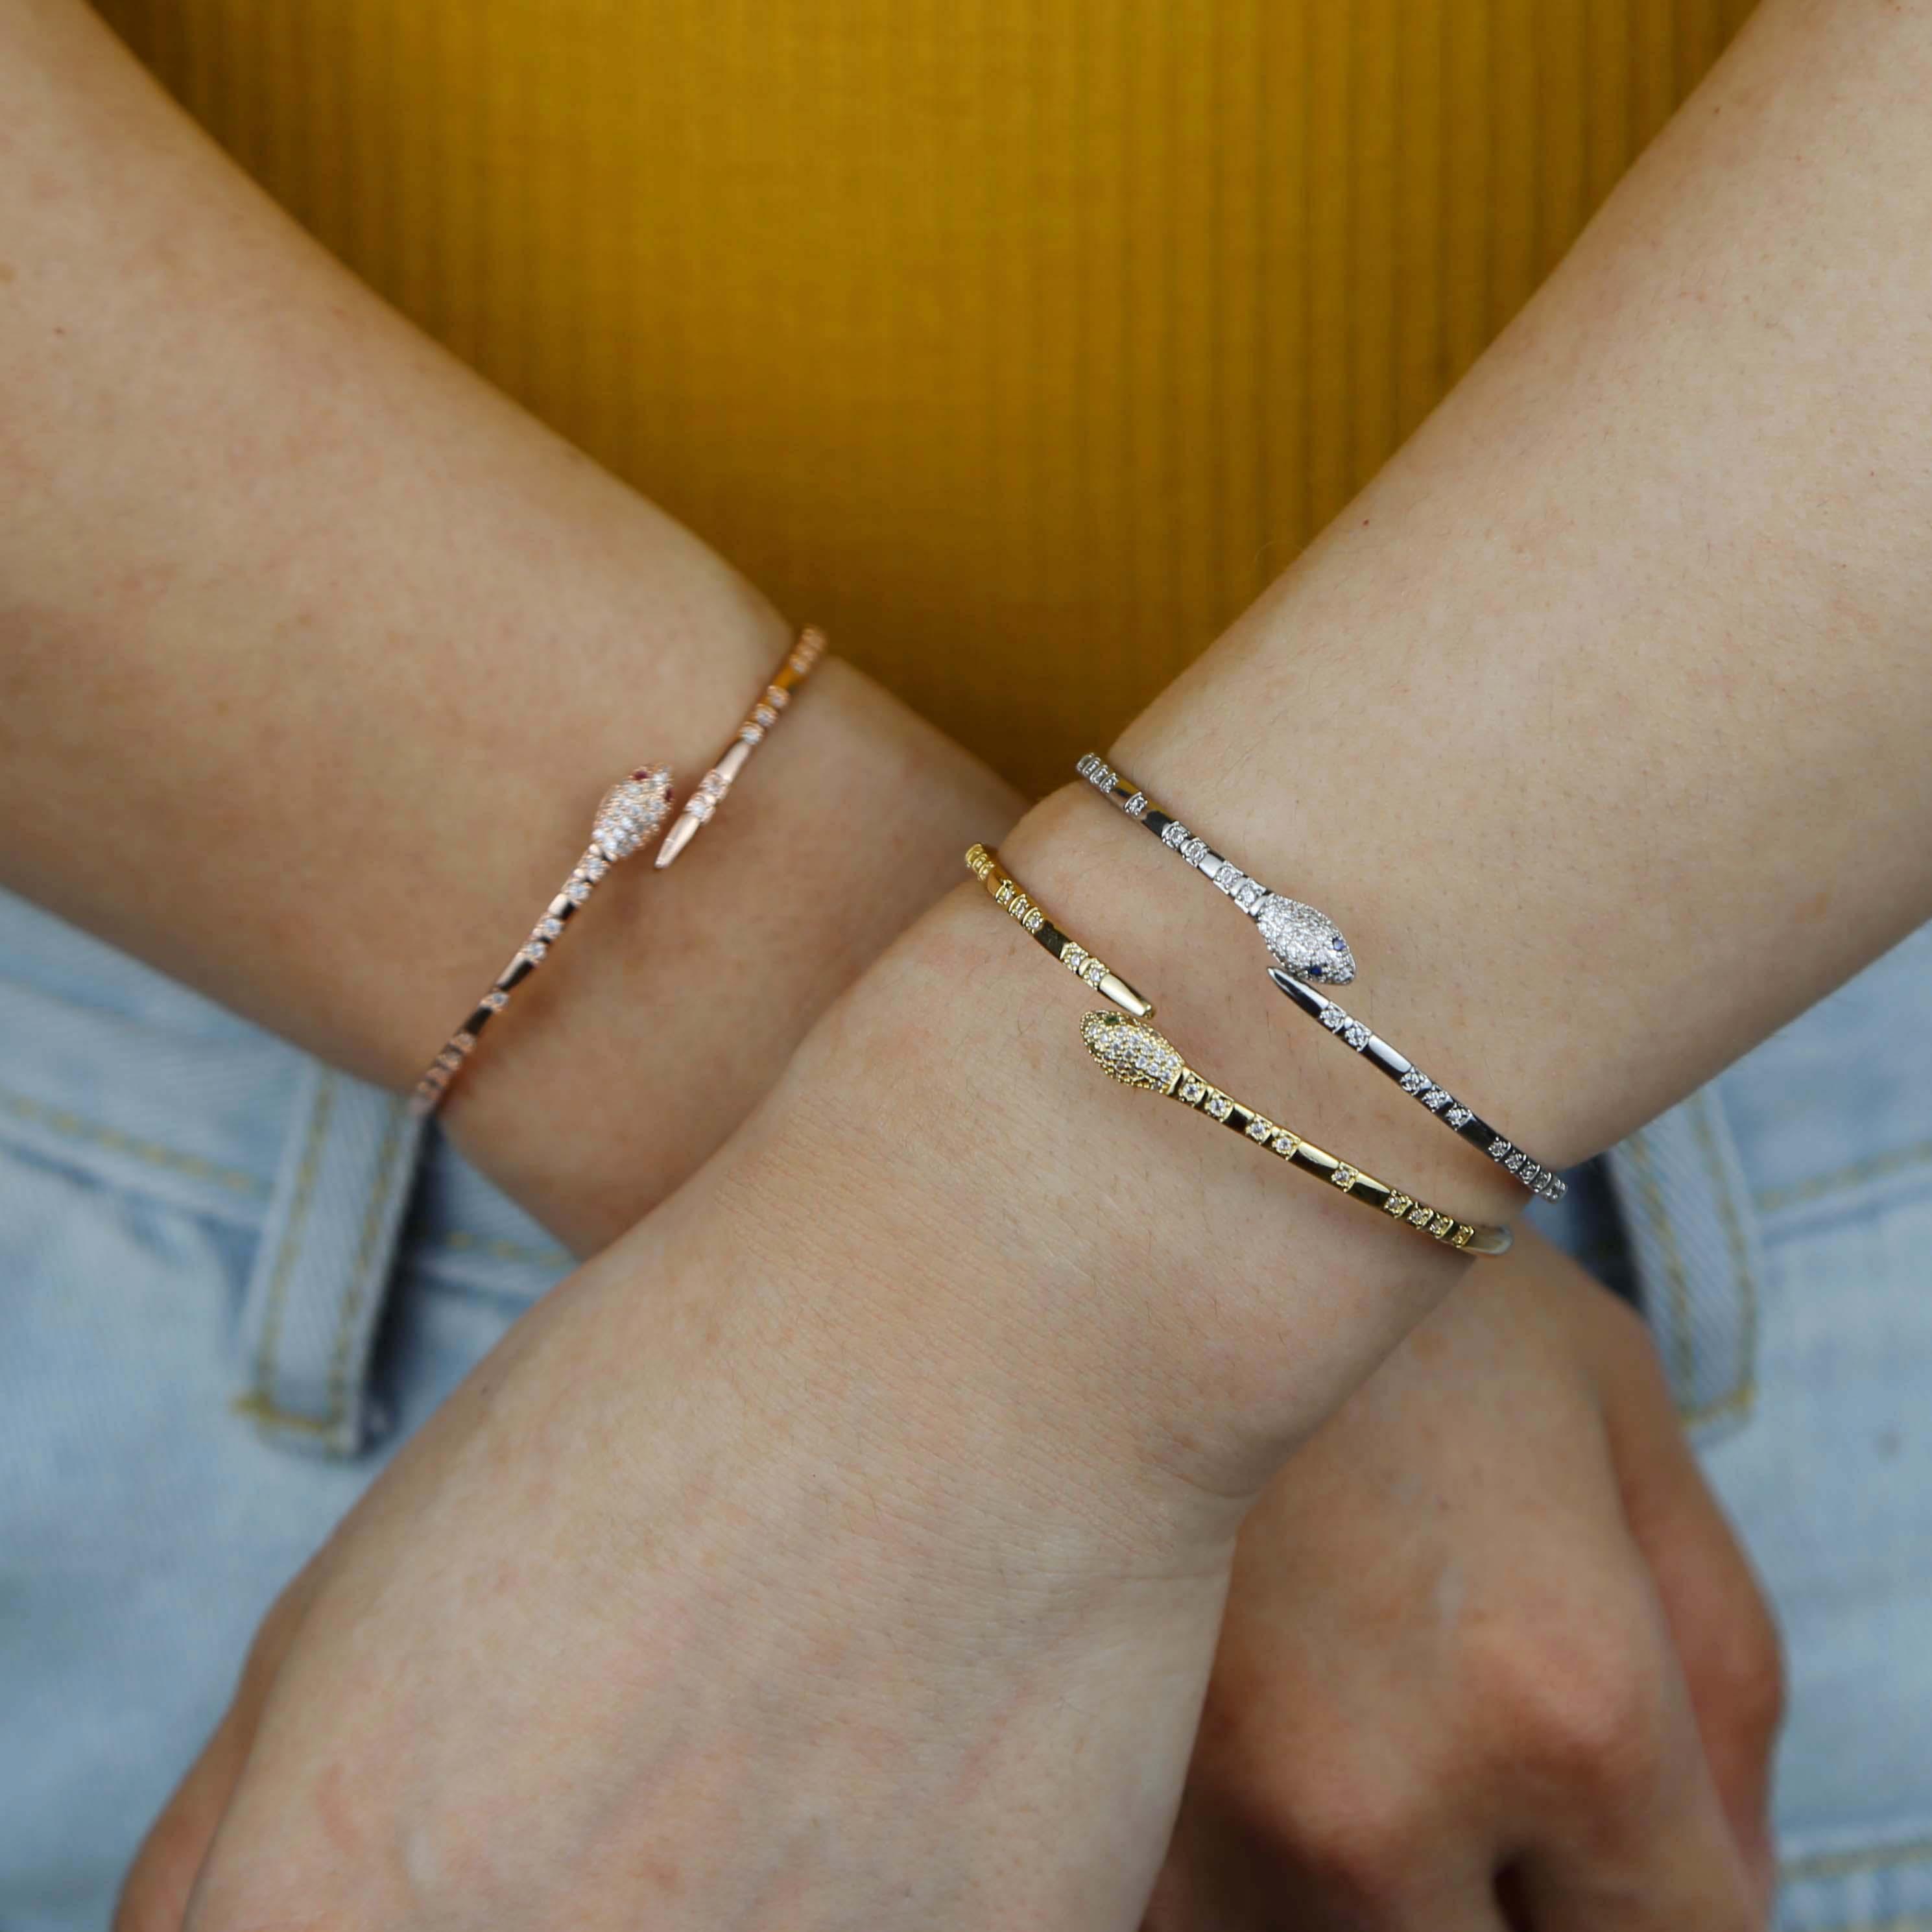 open adjusted fashion cz bangle bracelet for women girl red  green blue eye snake shaped cuff bangles-3